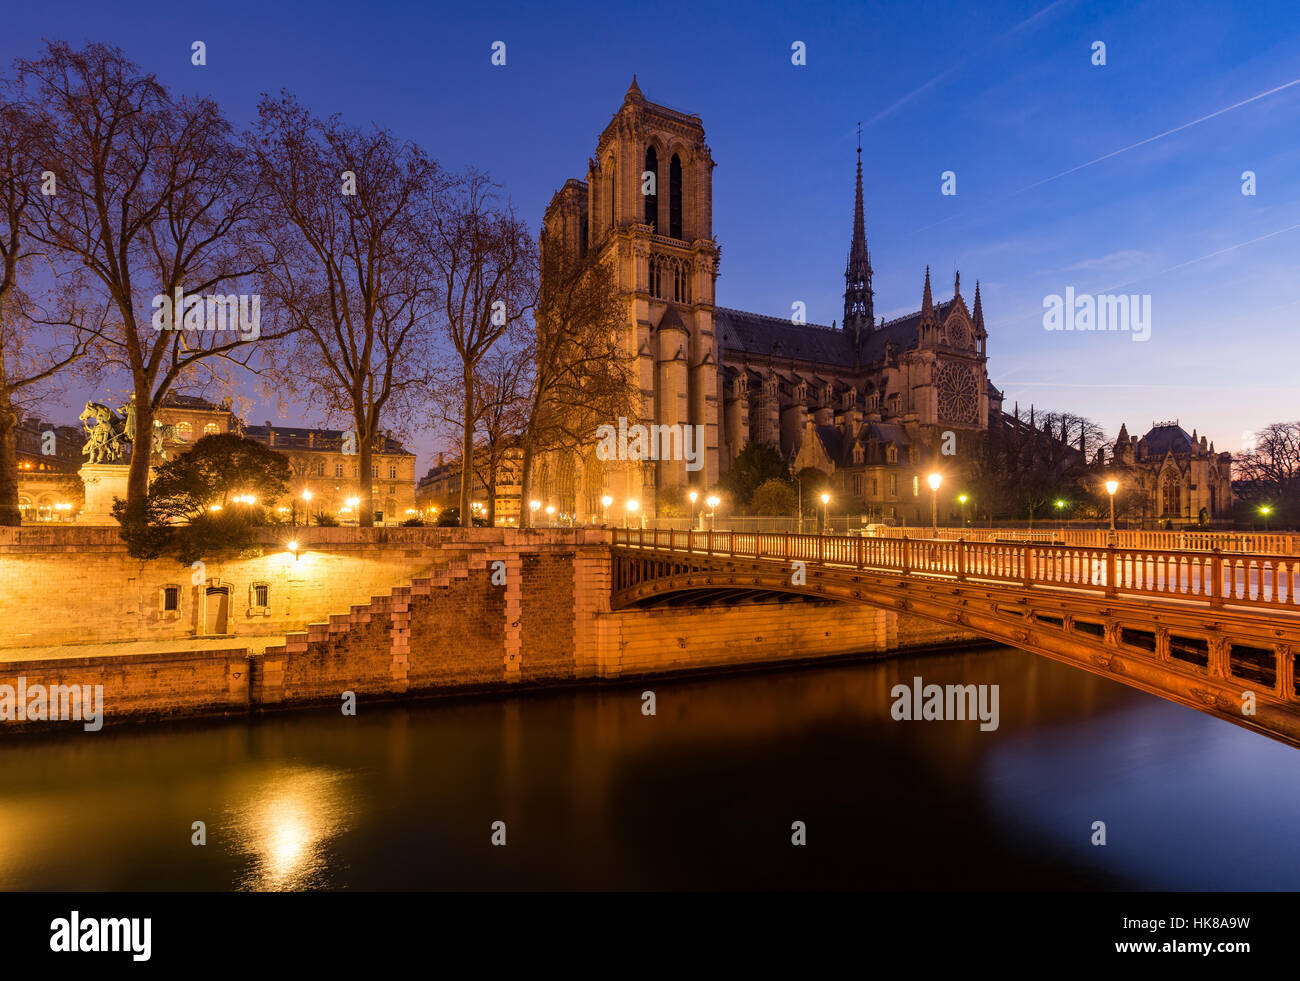 Catedral de Notre Dame al amanecer con el Sena y el Pont au Double. Ile de La Cite. 4Th Arrondissement, París, Imagen De Stock